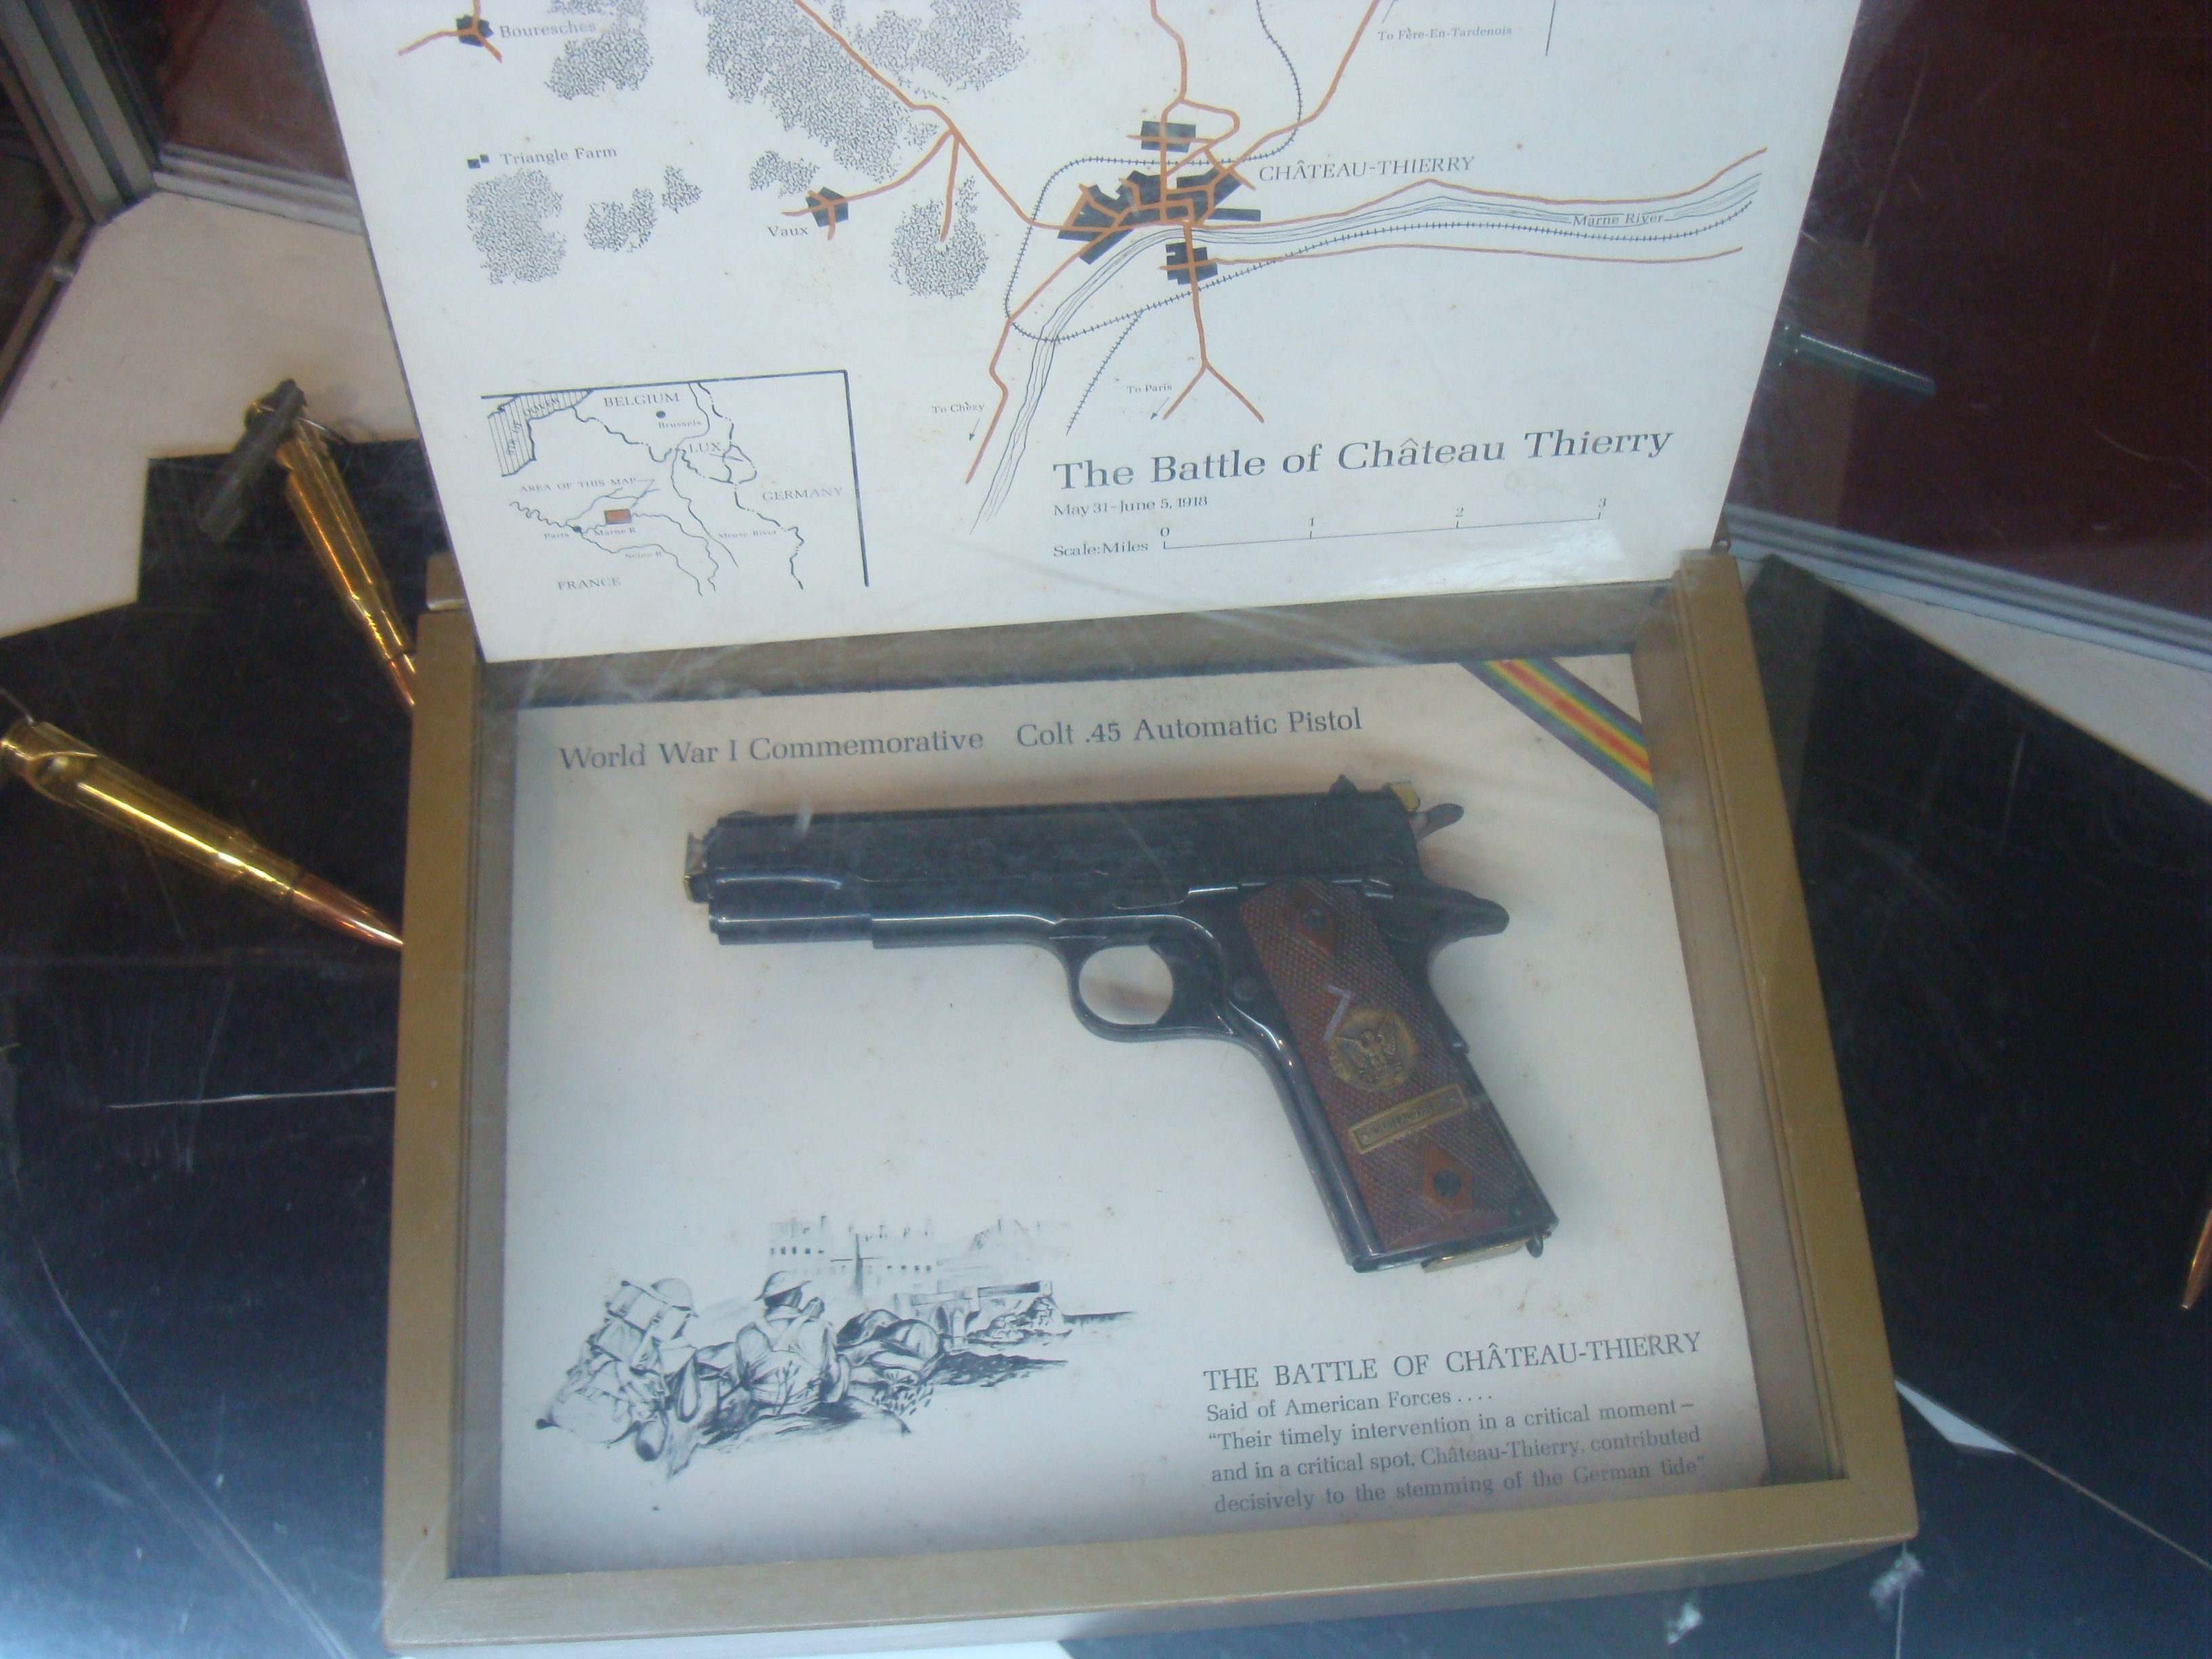 FAMAS? More like the Croatian VHS assault rifle